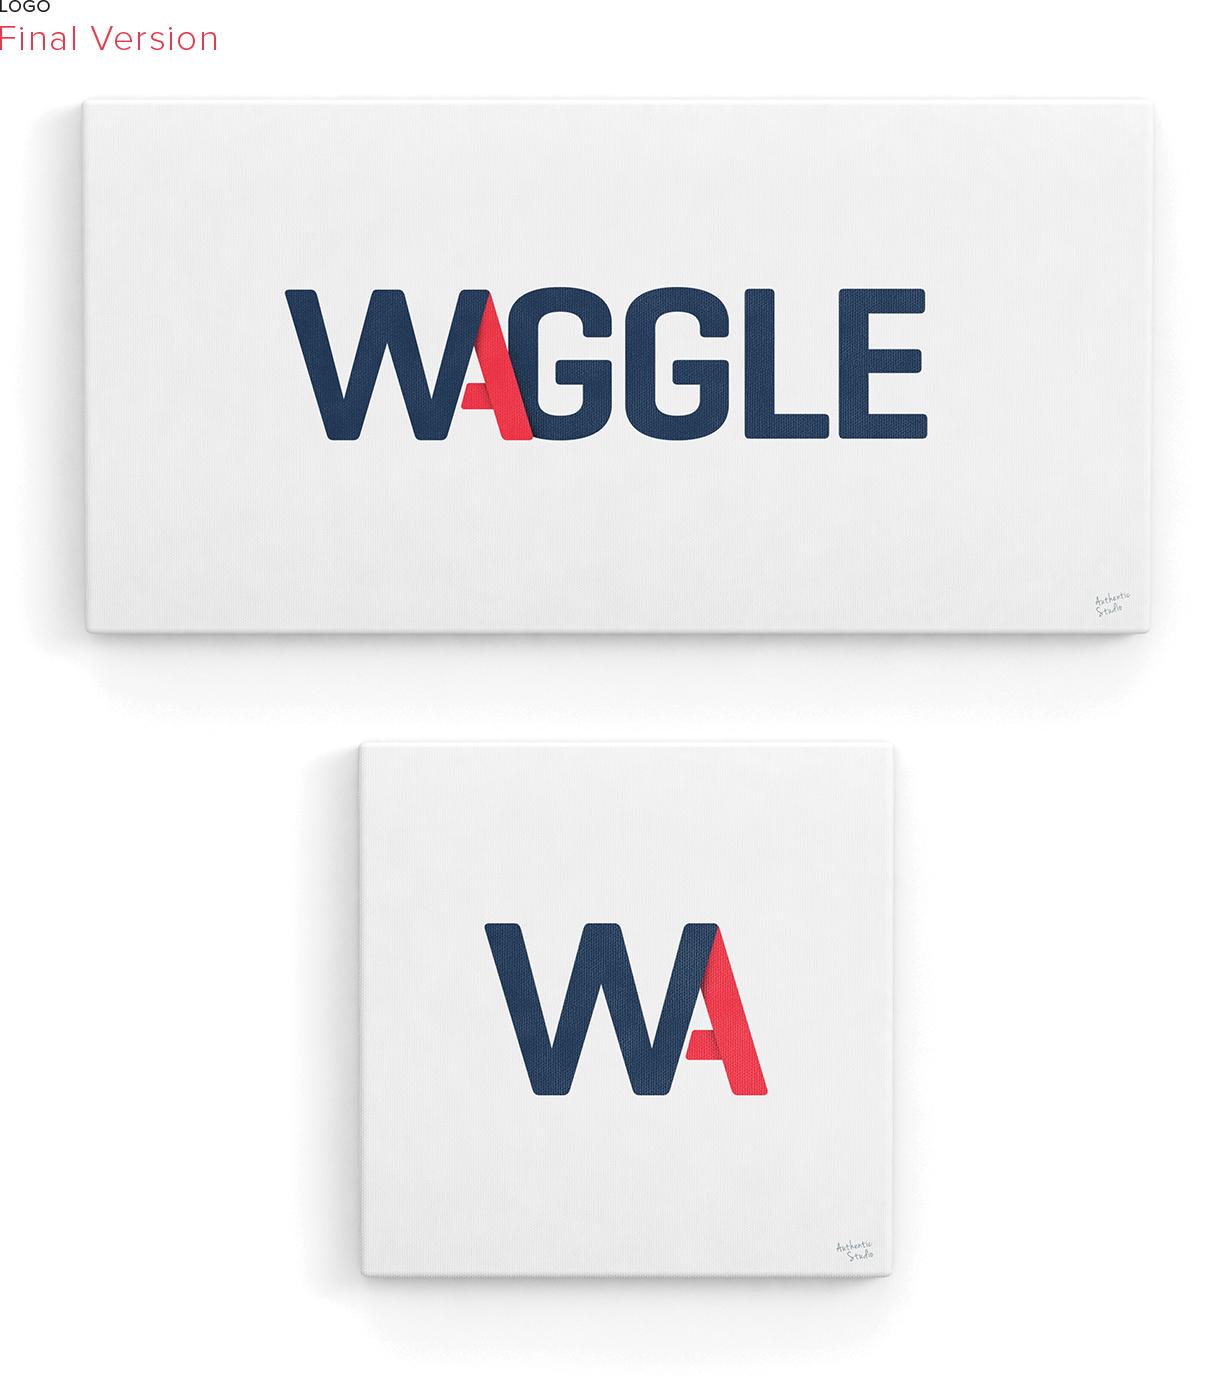 https://media.authentic-studio.com/web-content/uploads/2020/11/logo-design-alternatives-and-final-for-application.jpg